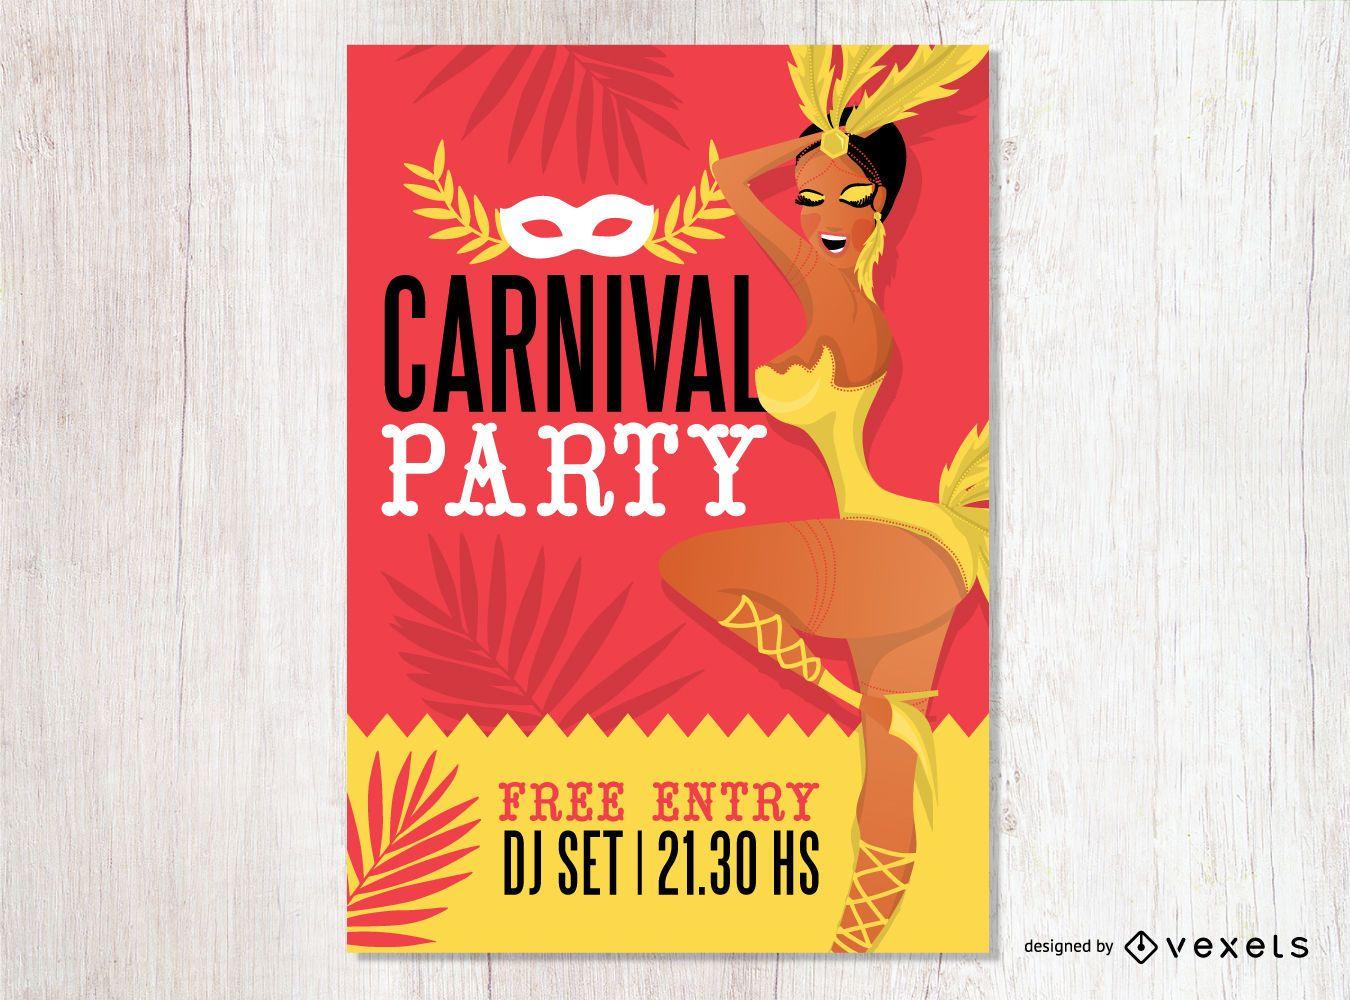 Carnival party flyer design